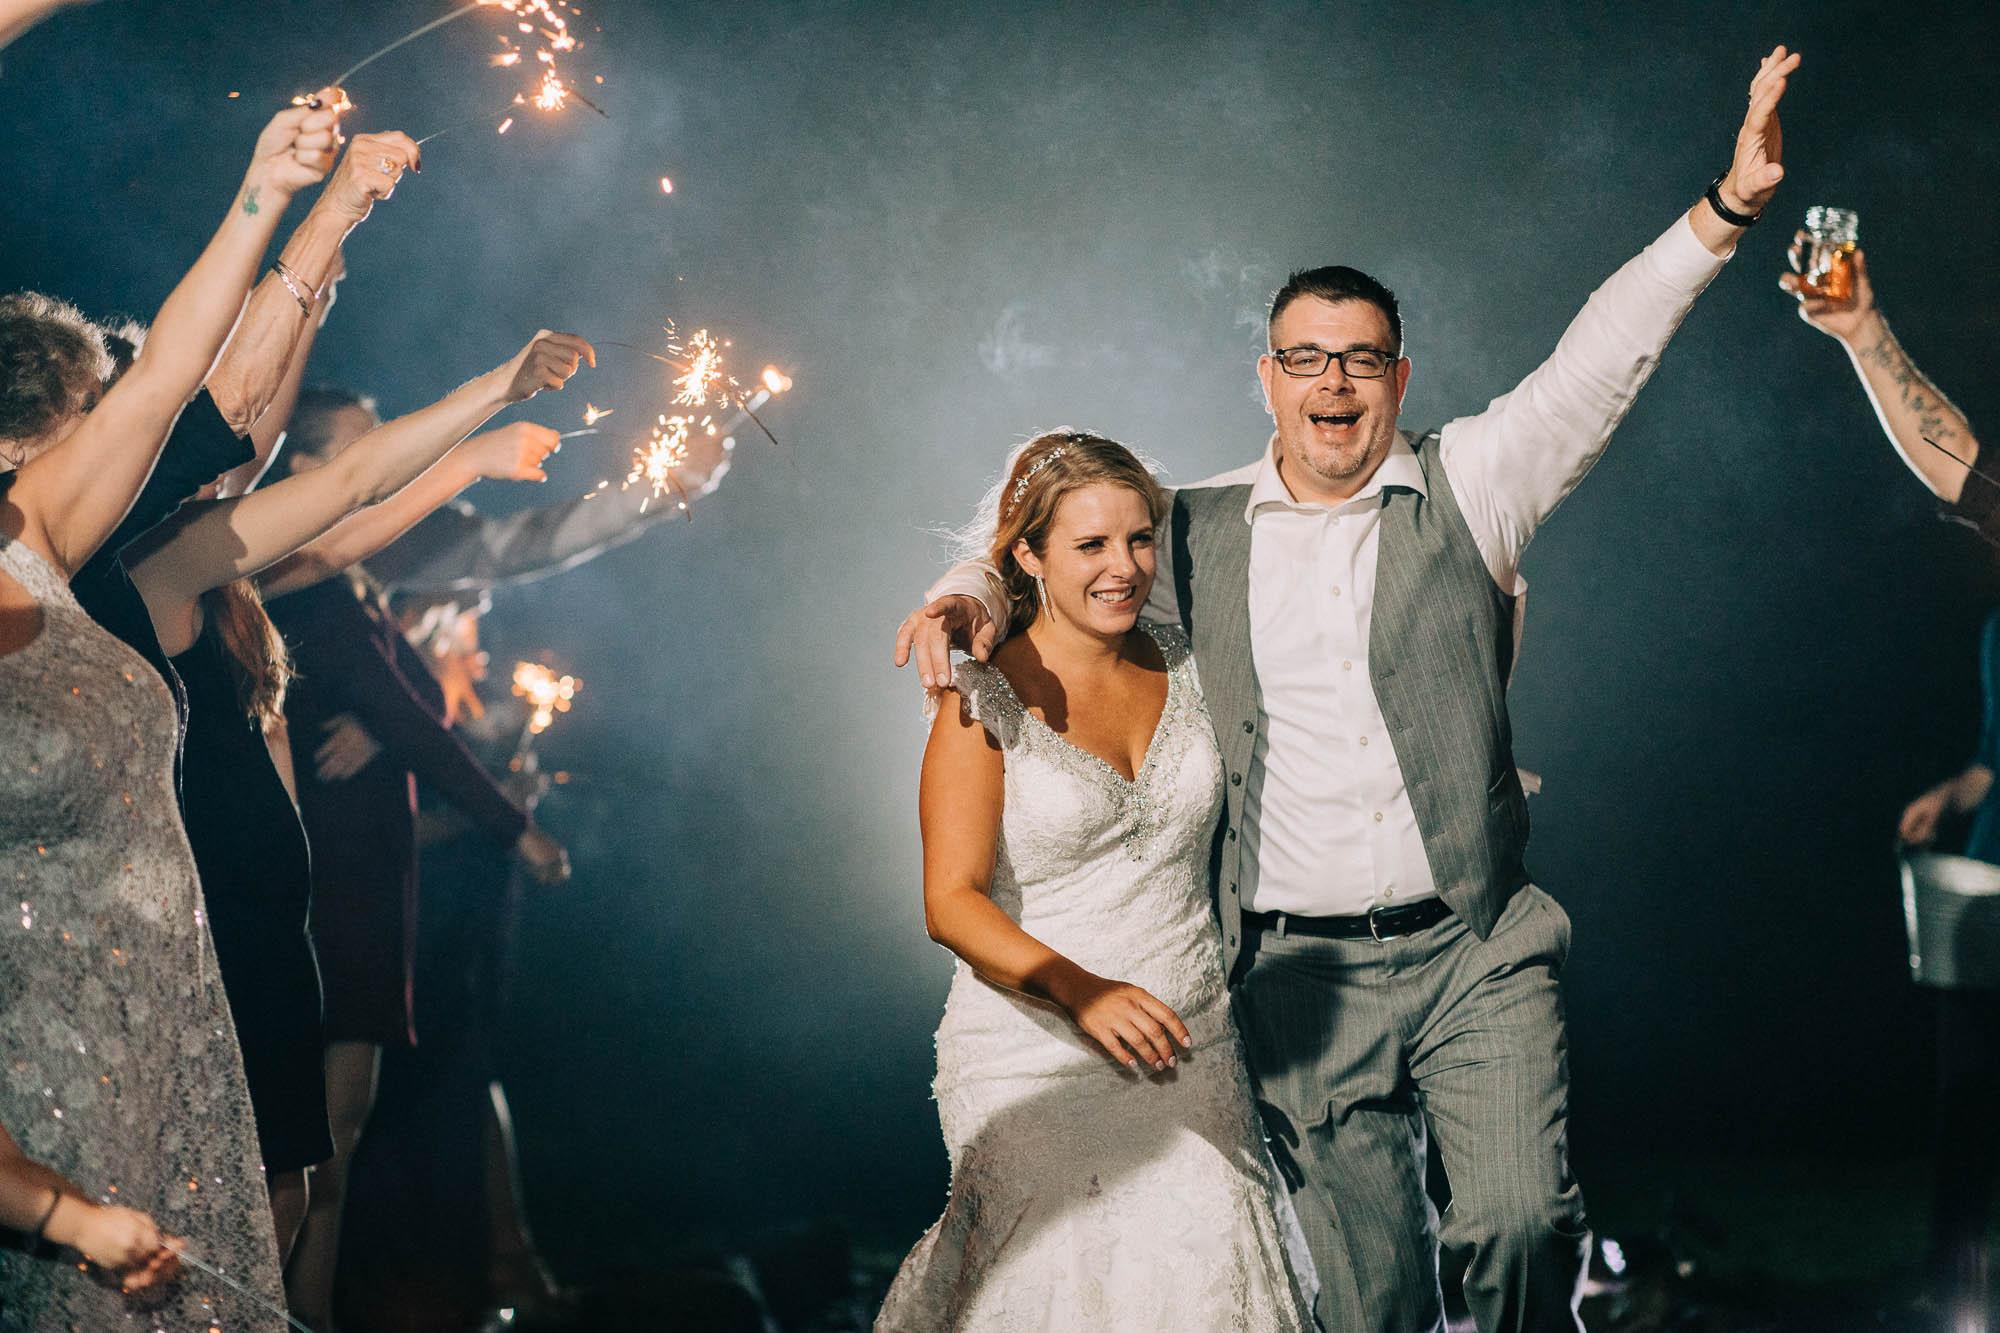 Lodge-at-Raven-Creek-October-wedding-89.jpg